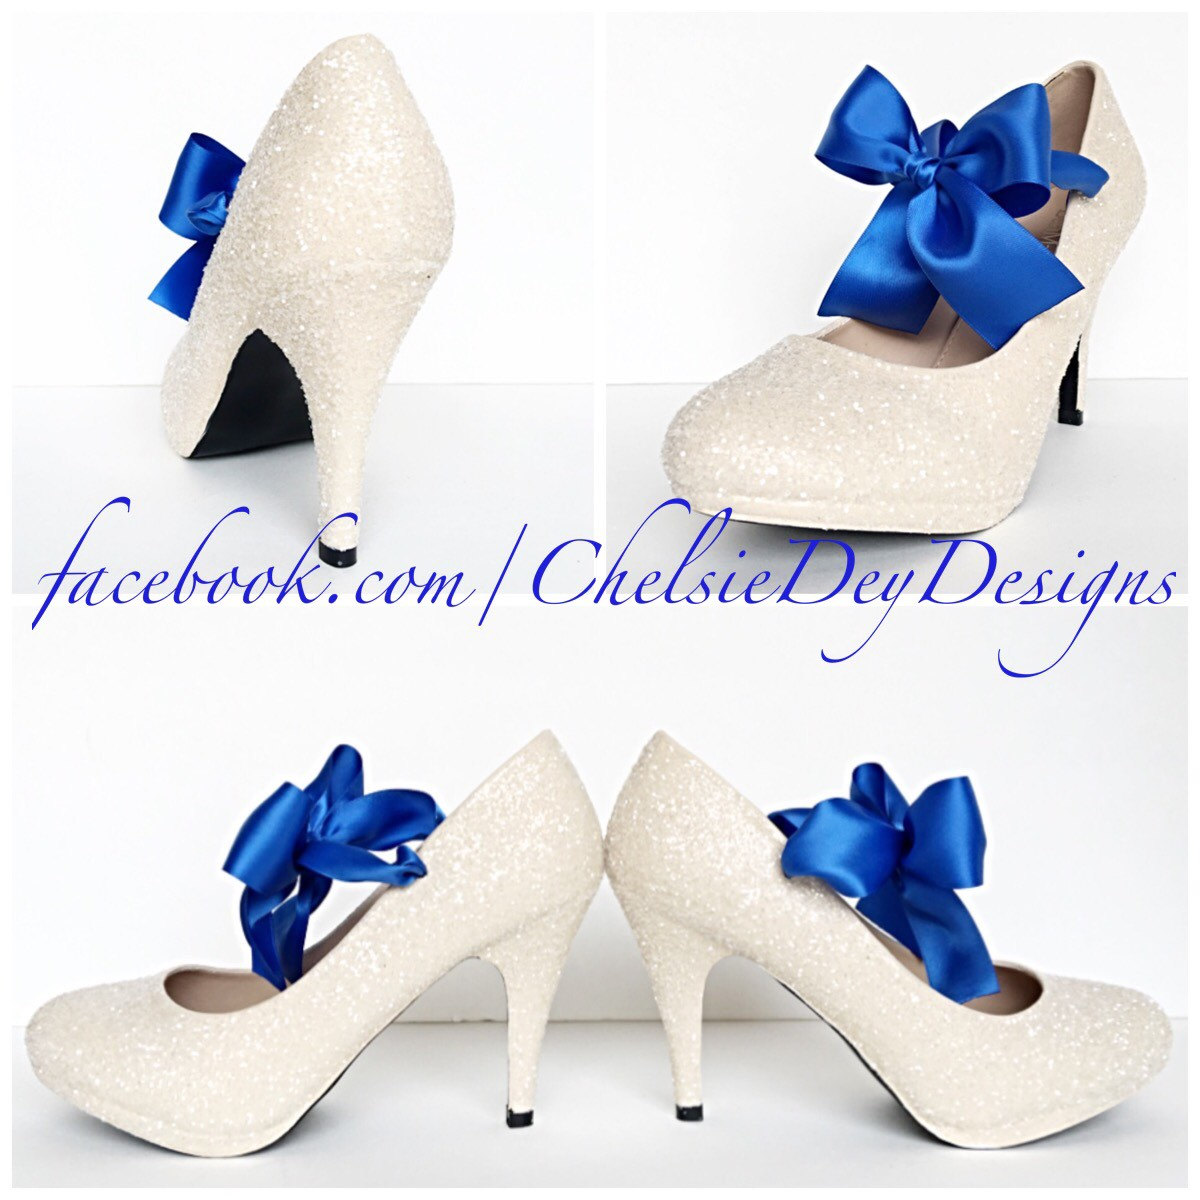 7c38aeaa9188 Off White Ivory High Heels - Glitter Pump High Heels - Royal Blue Satin  Bows -